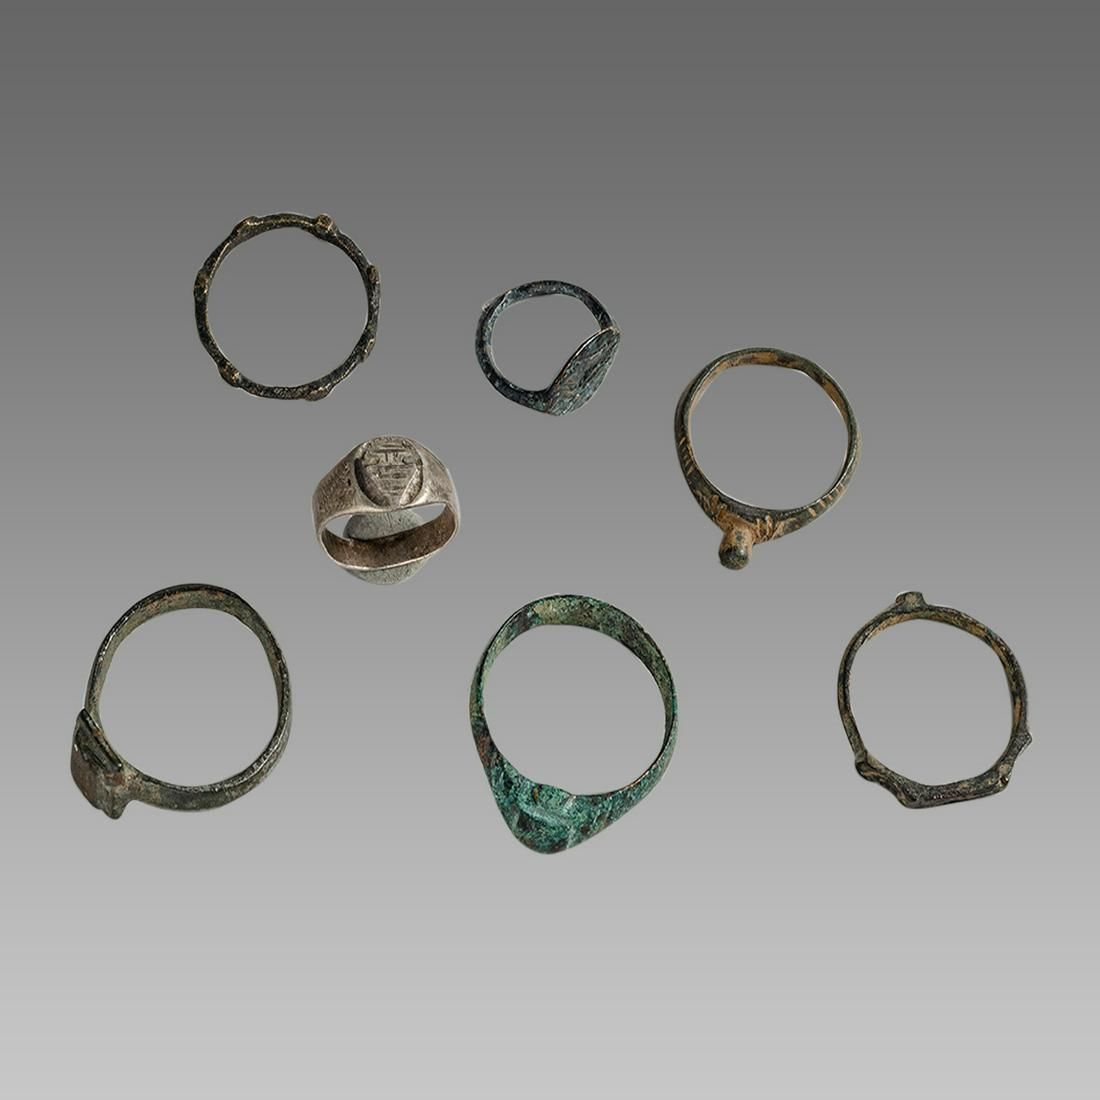 Lot of 7 Ancient Roman, bronze Rings c.1st-4th century